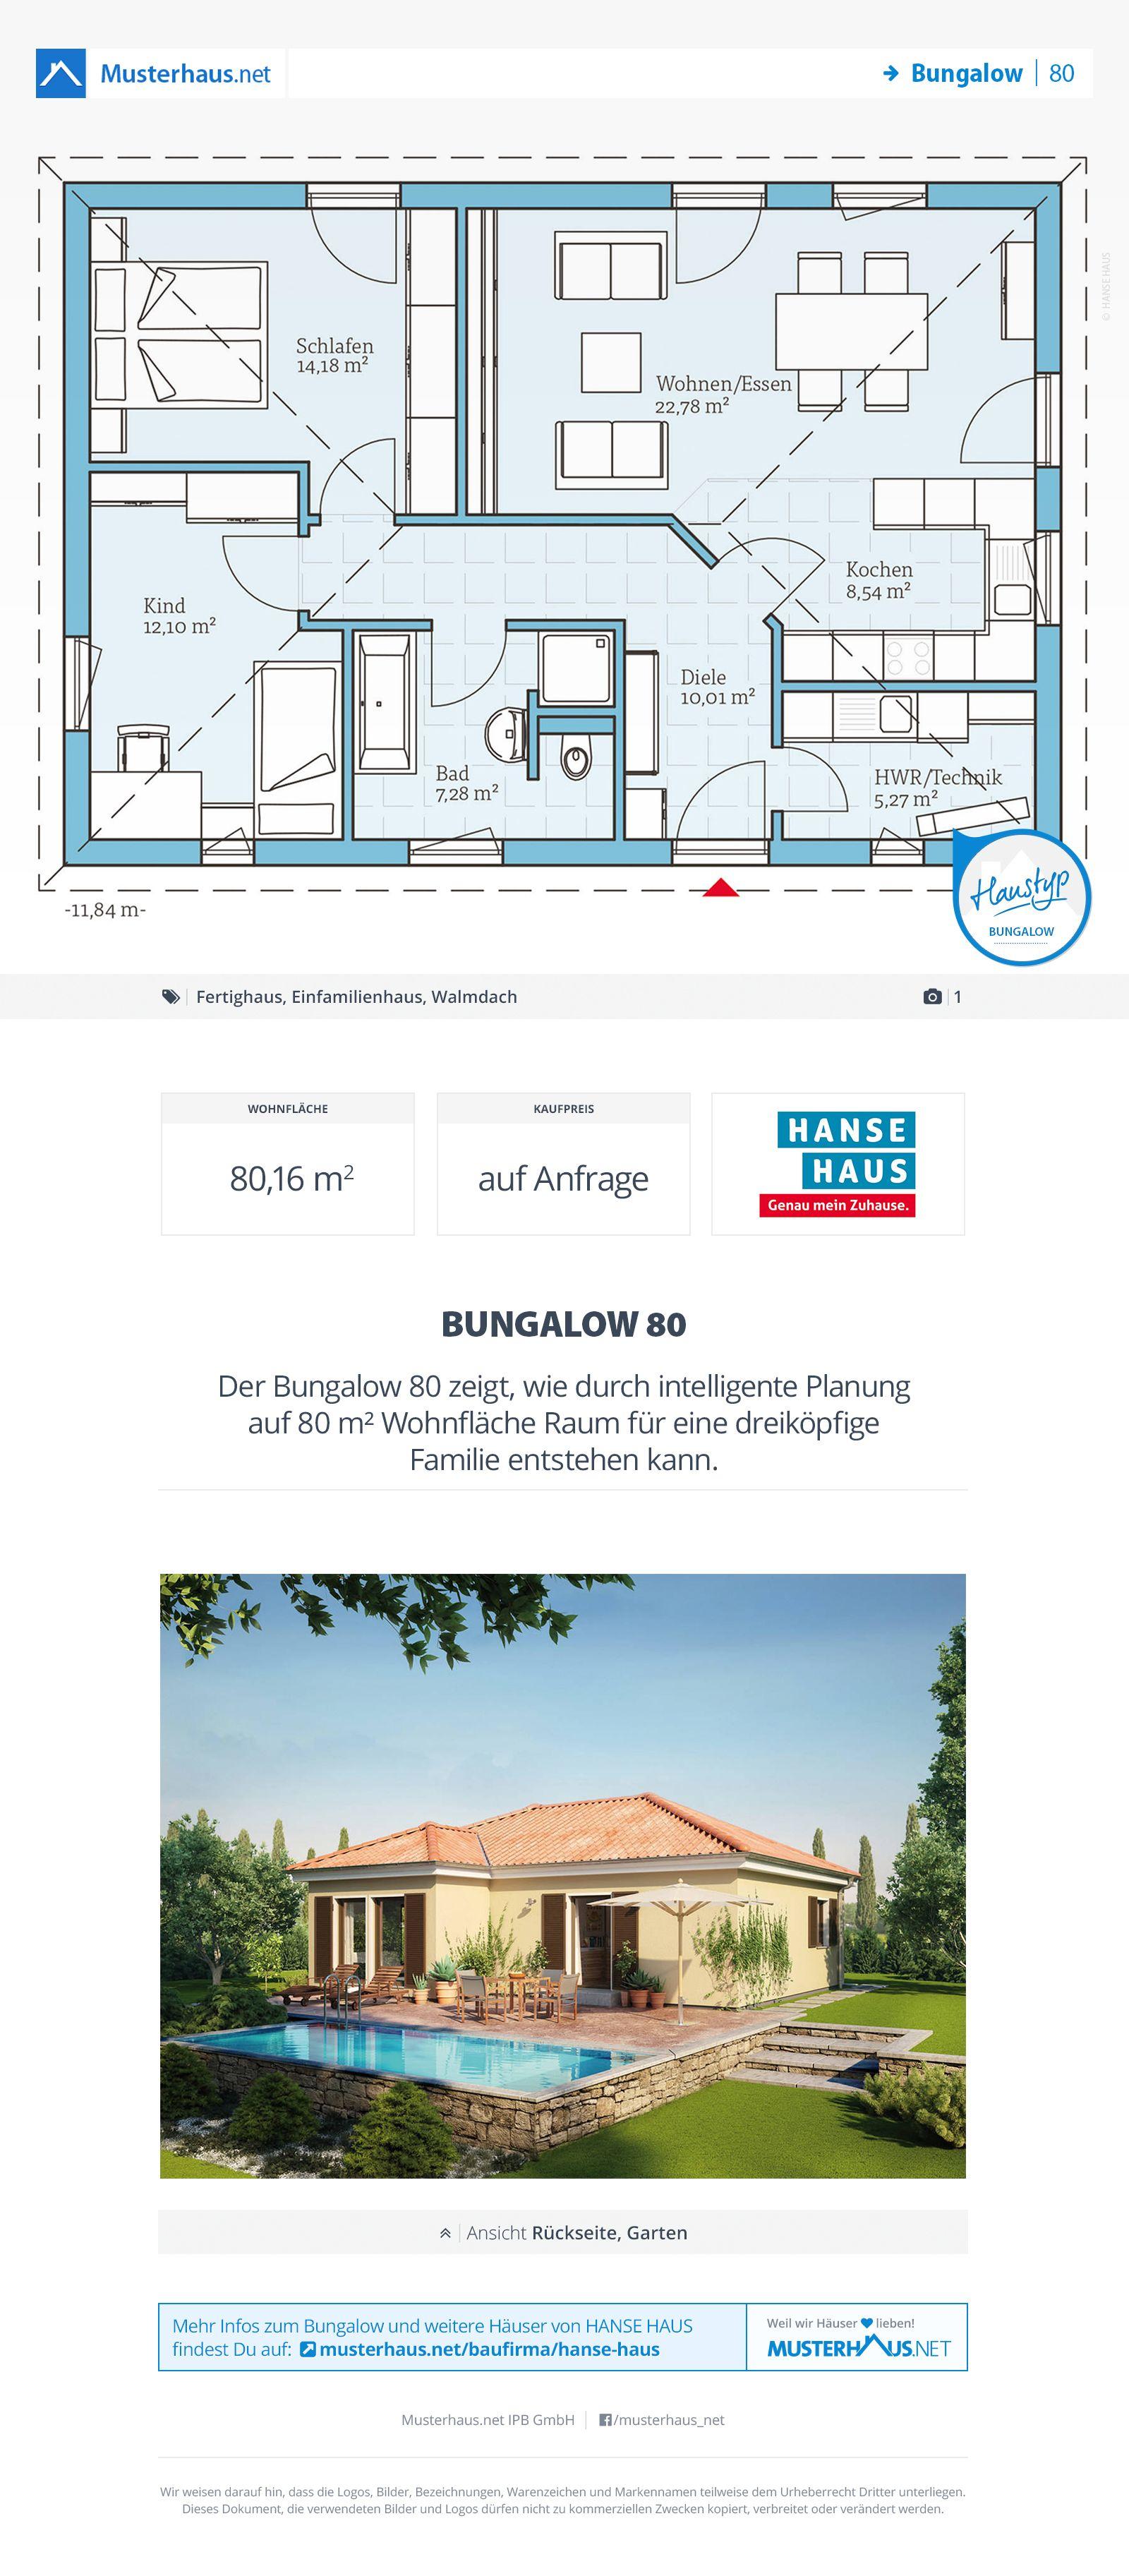 Bungalow Offene Küche | Bungalow 80 In 2018 Grundrisse Grundriss Bungalow Haus Bungalow